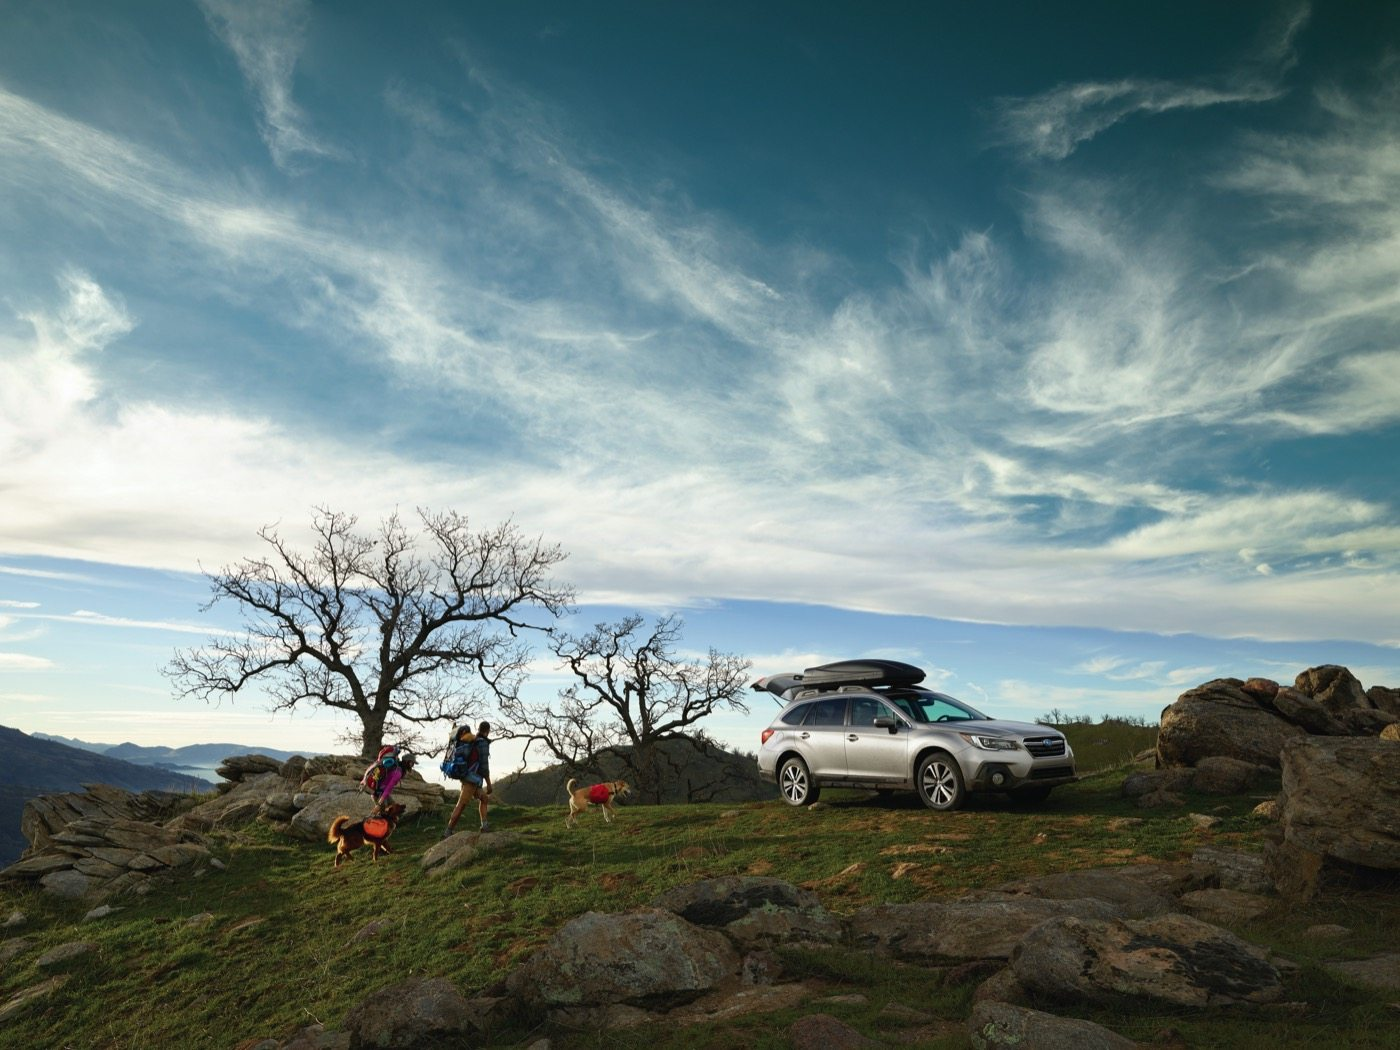 2018 Subaru Outback - Image: Subaru